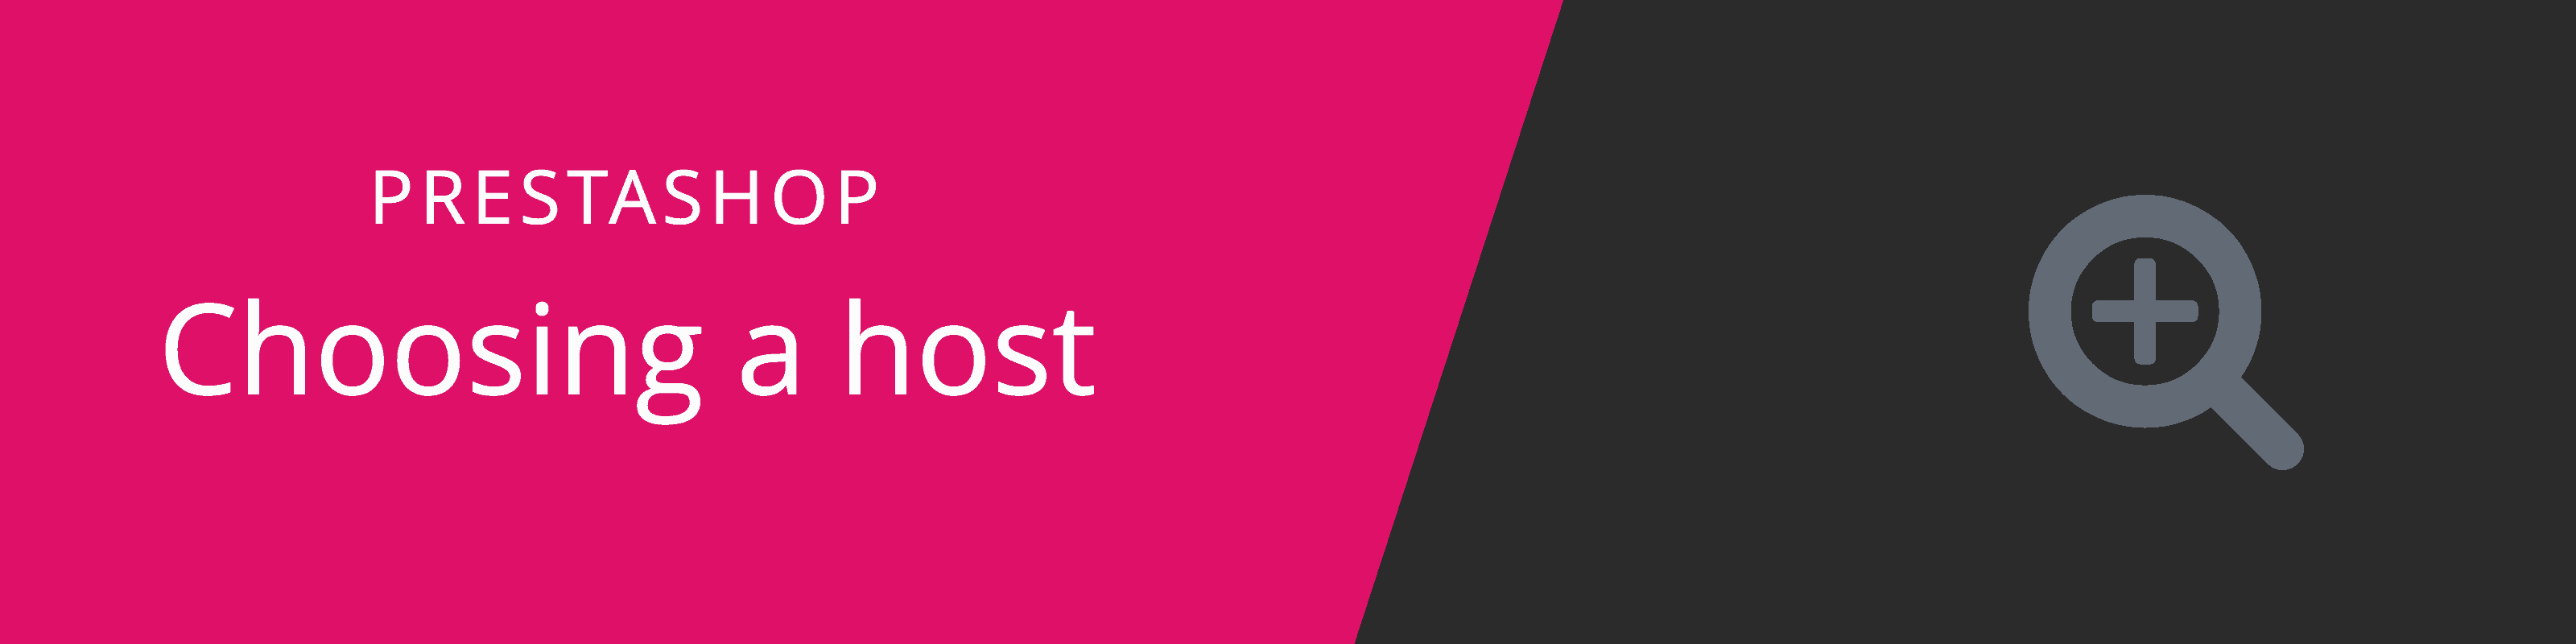 choosing prestashop host